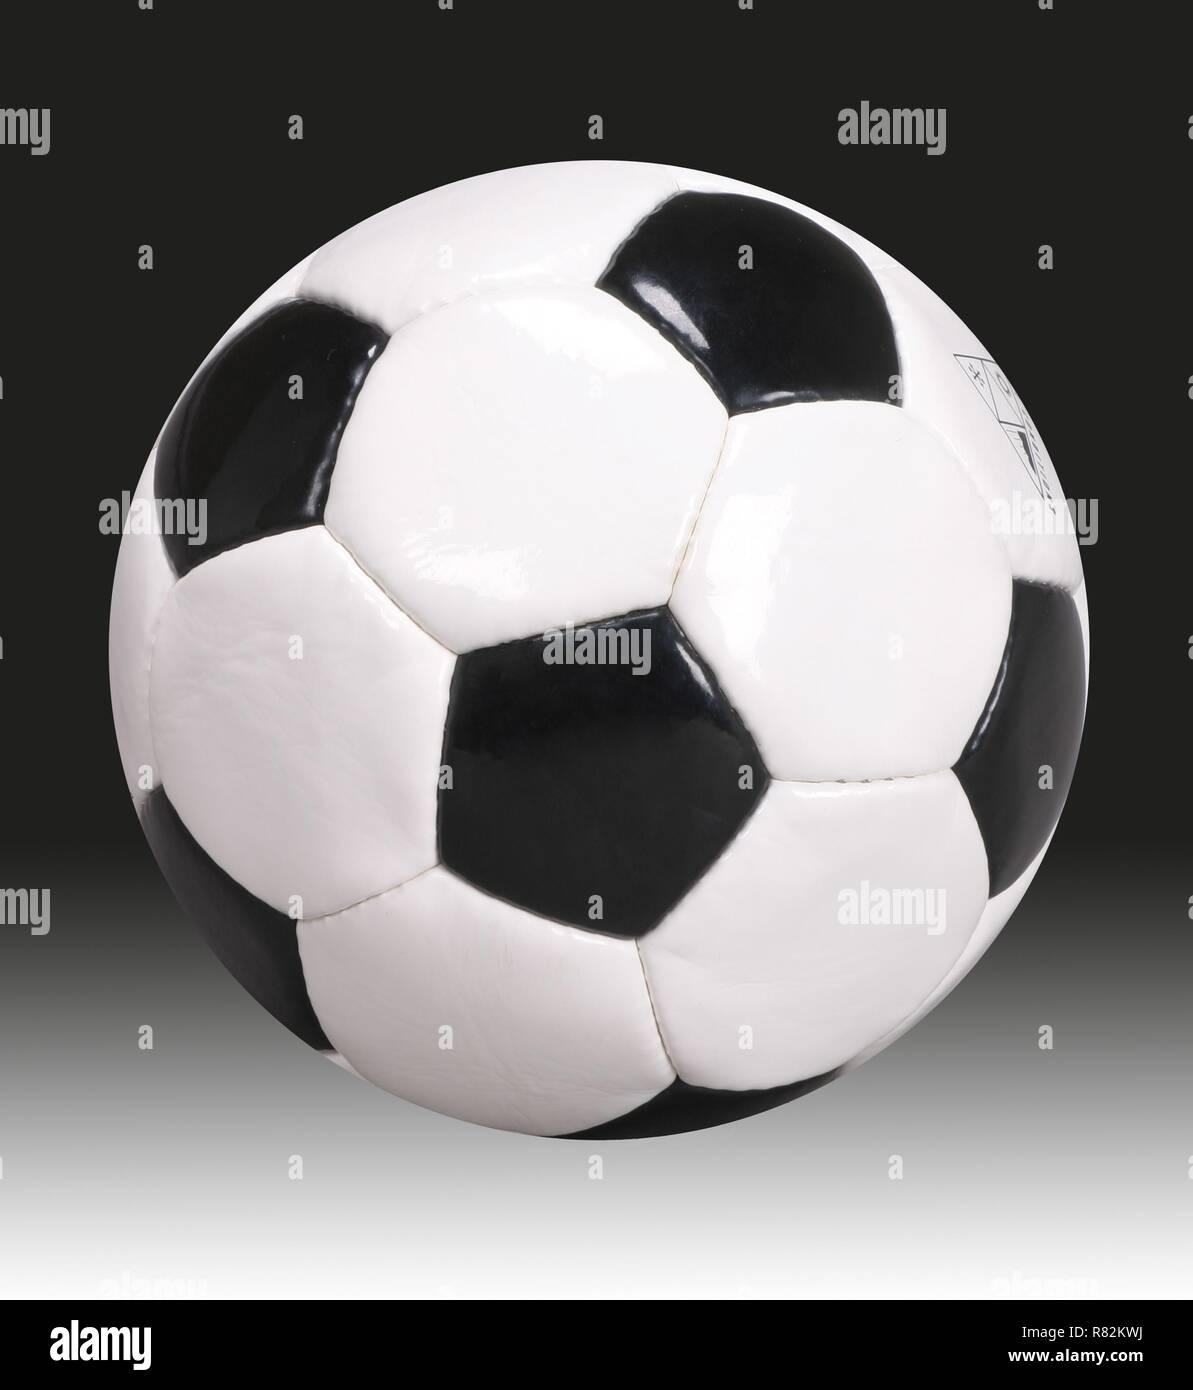 Soccer Ball Panels Imágenes De Stock & Soccer Ball Panels Fotos De ...